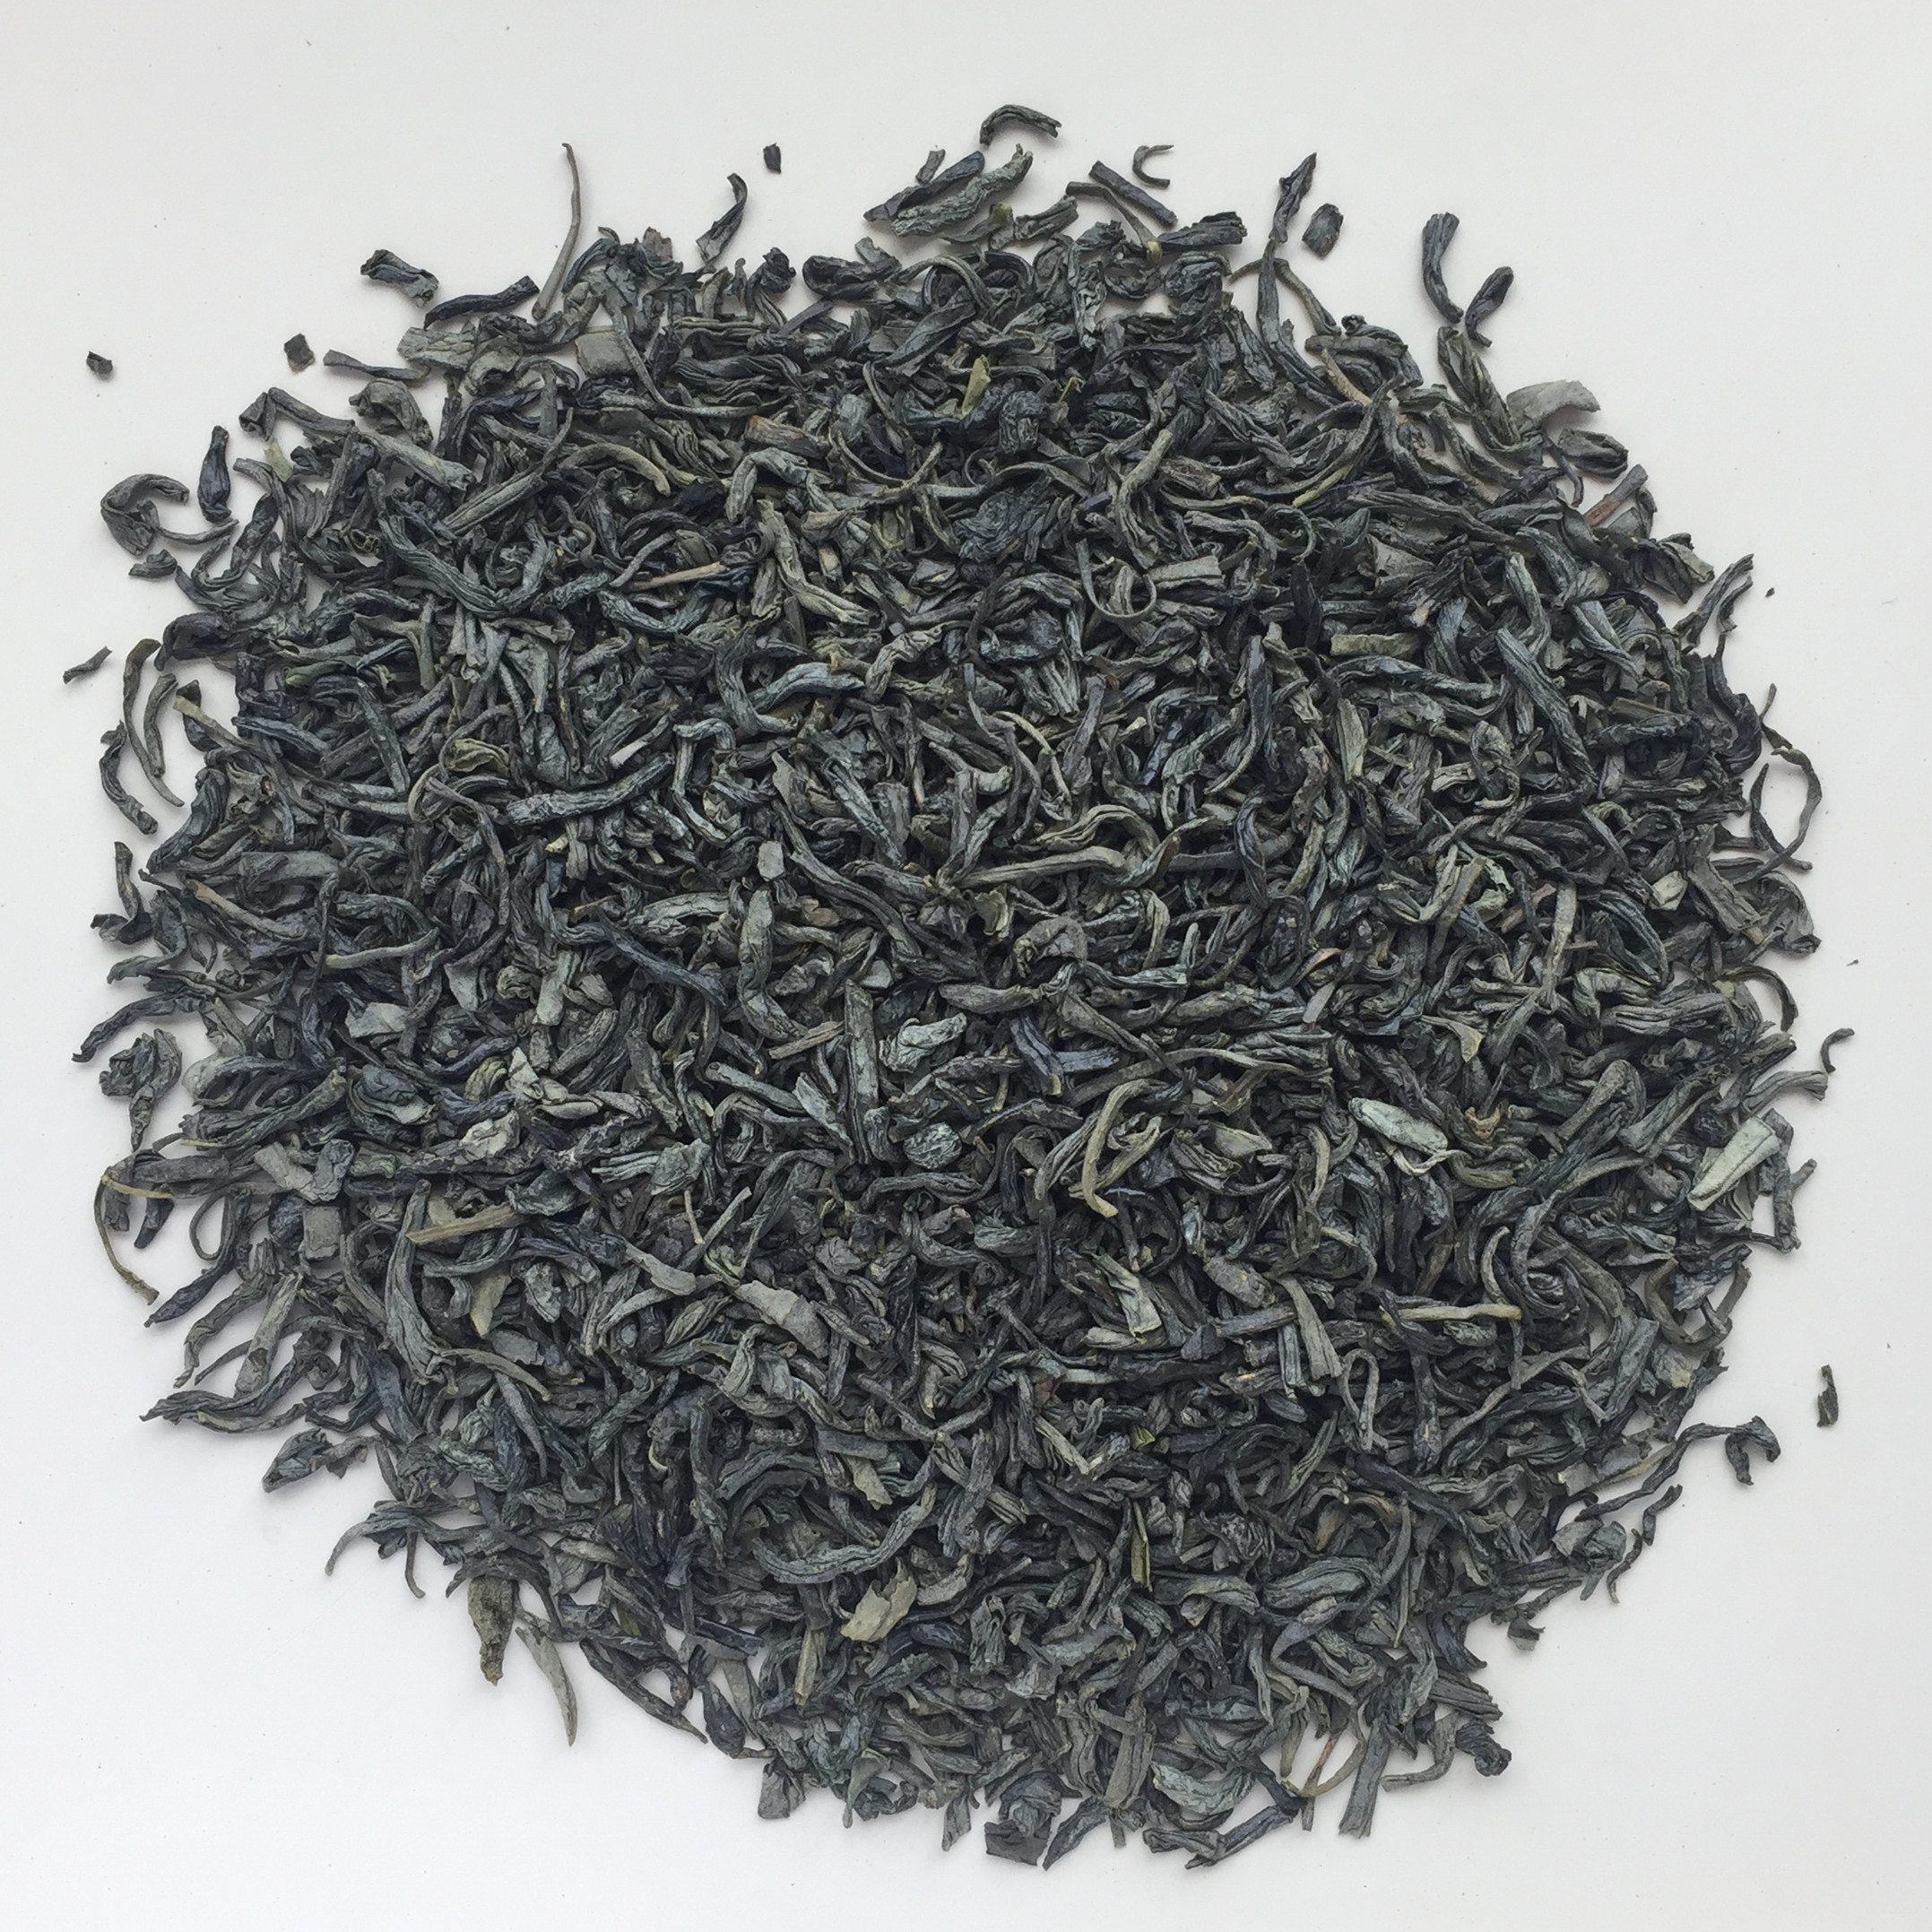 CHUNMEE TEA CHINA GREEN TEA 41022 AAA - 4uTea | 4uTea.com